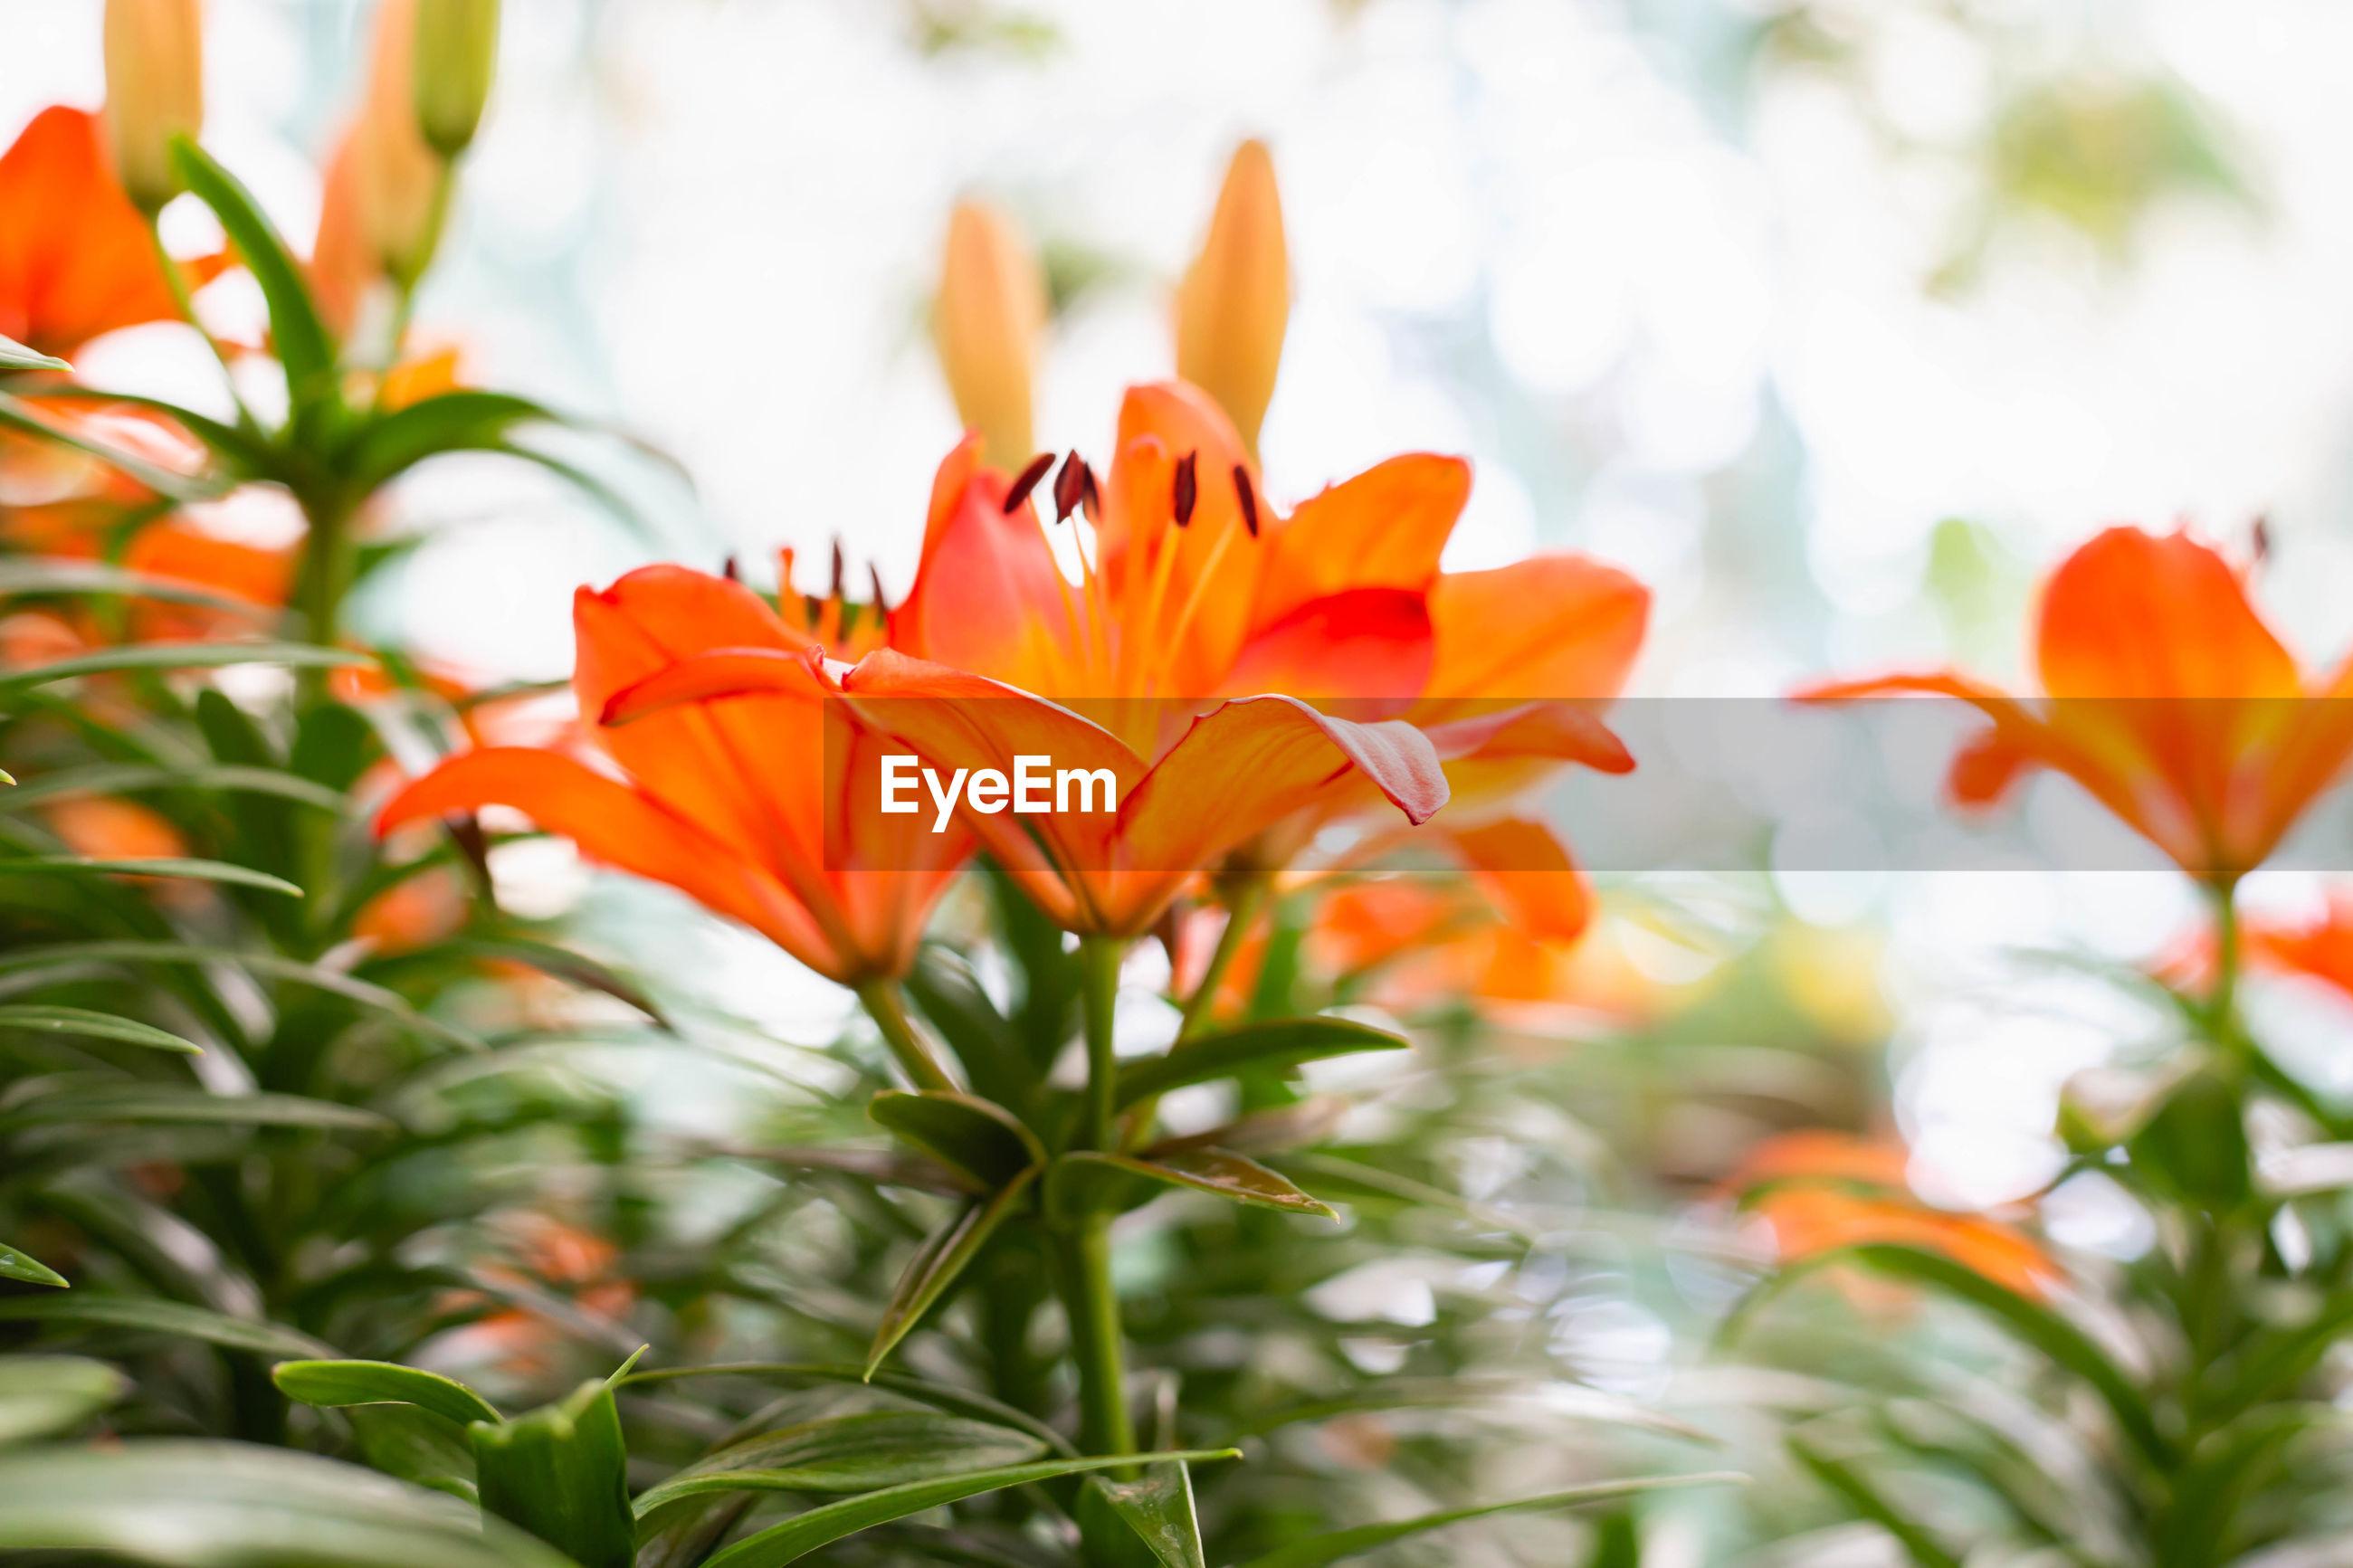 CLOSE-UP OF ORANGE FLOWER PLANT